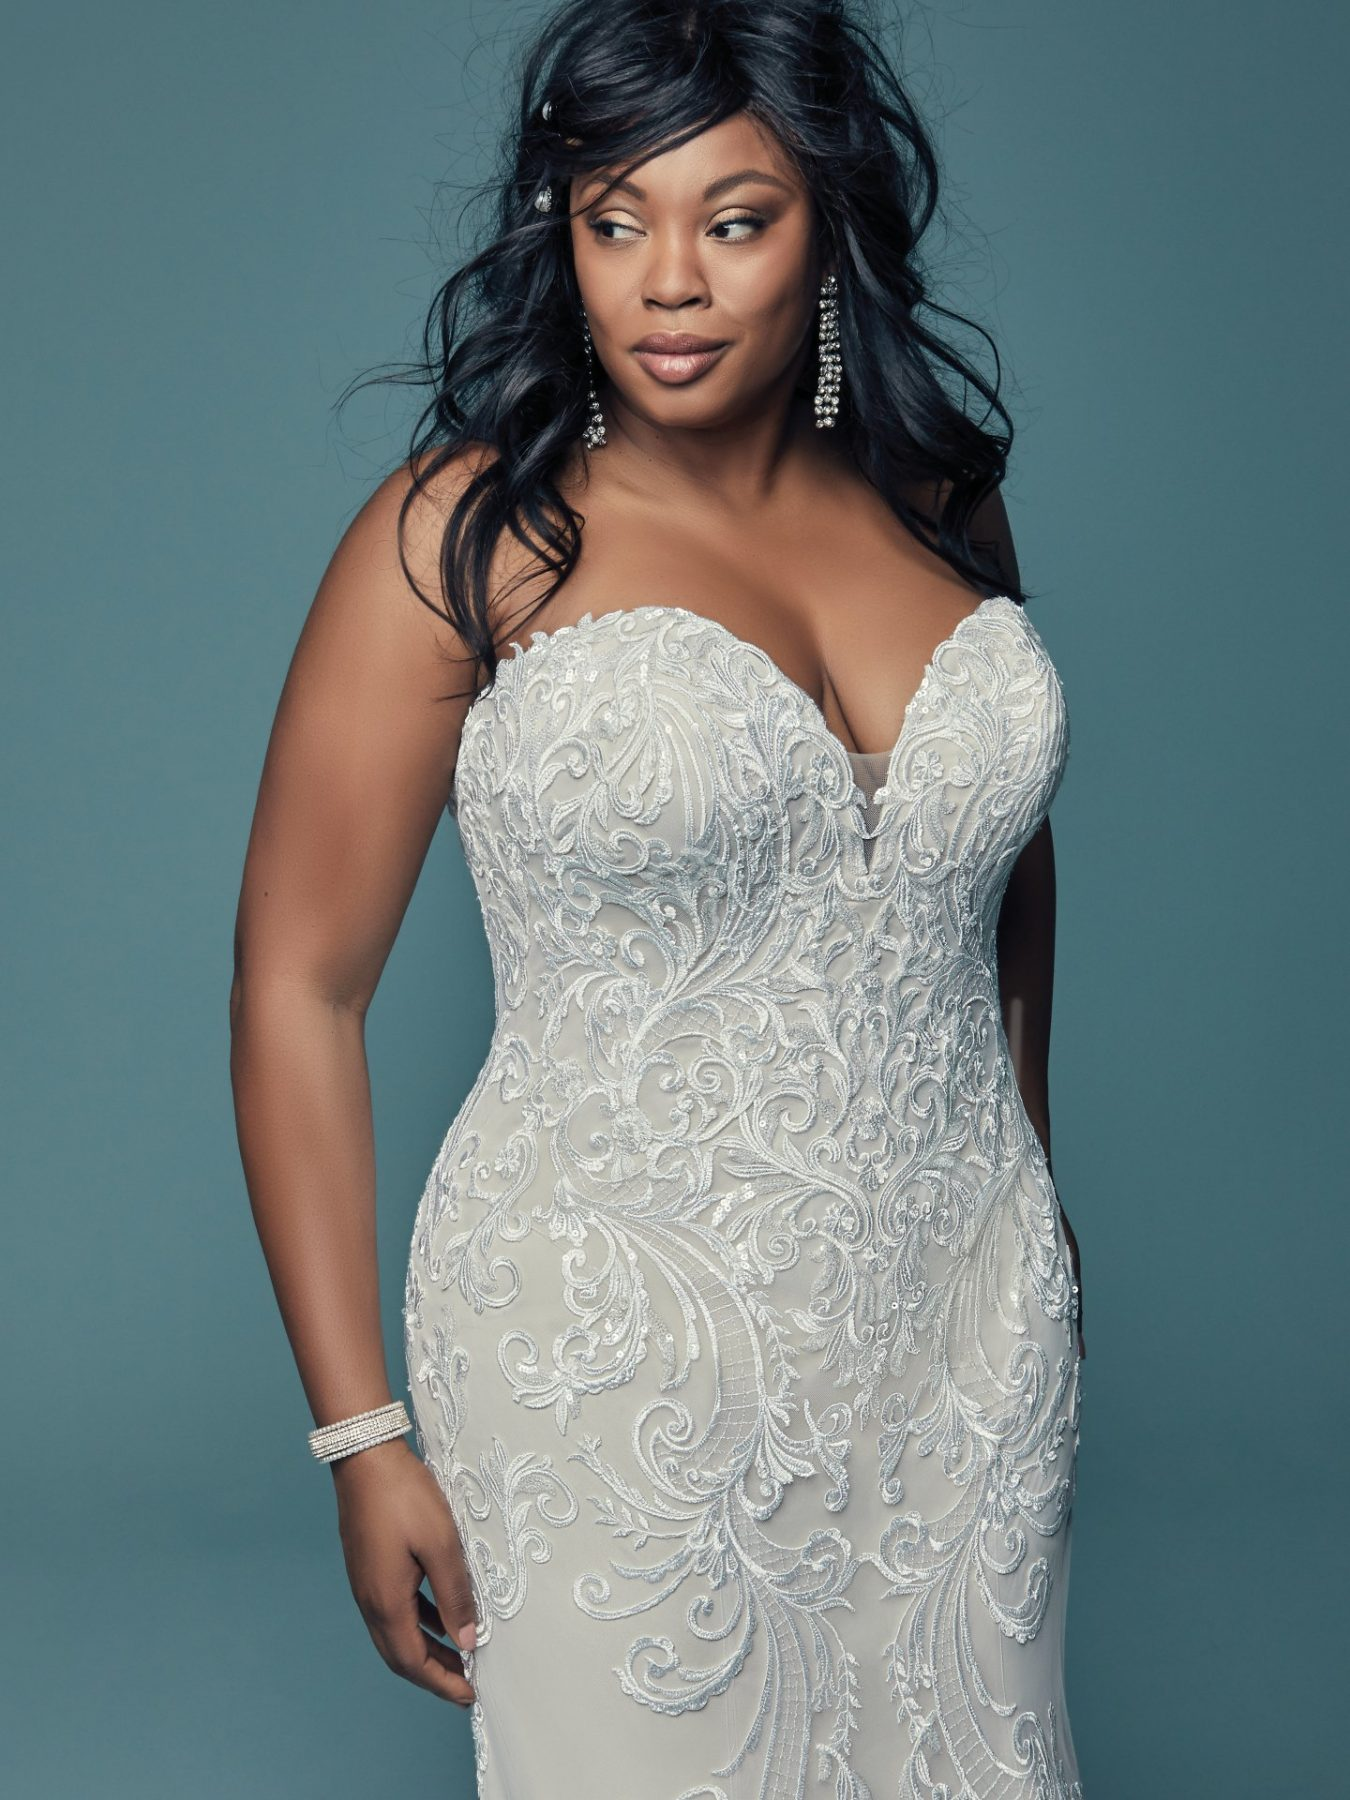 22 Designer Plus-Size Wedding Dresses That Prove Your Body ...